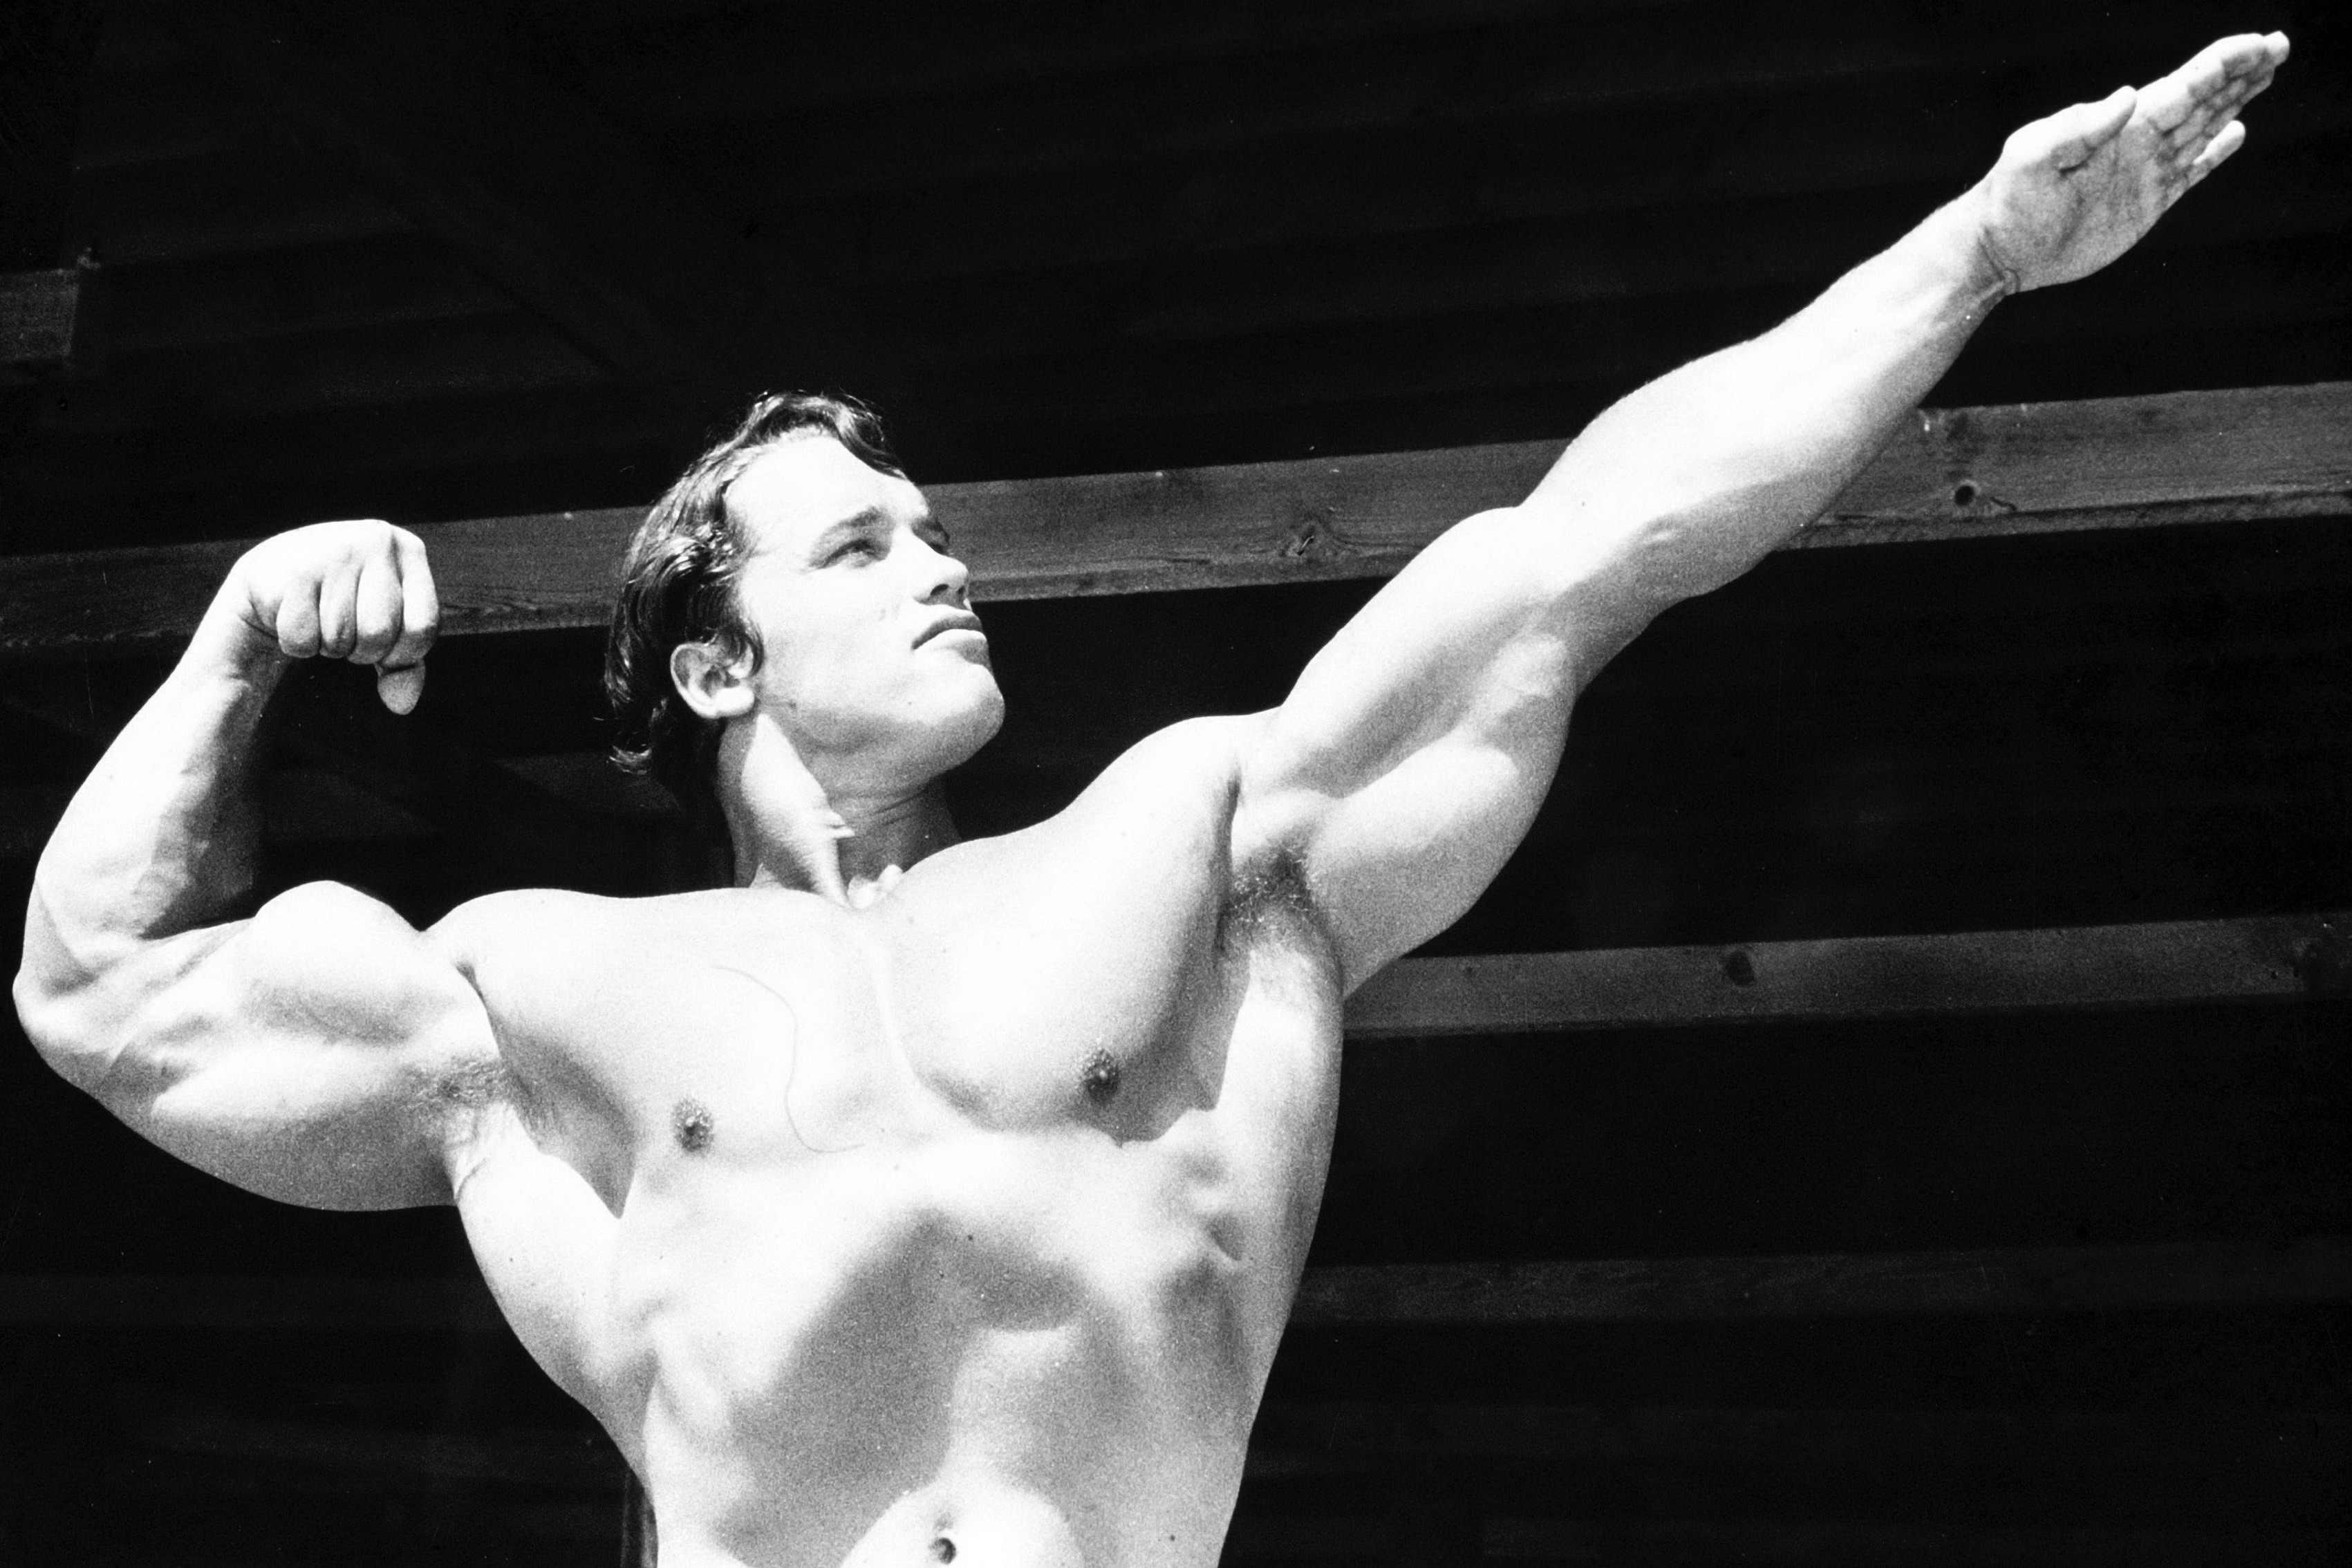 Conquer Arnold Schwarzenegger Young Bodybuilder Art Silk Poster 13x24 inch 68